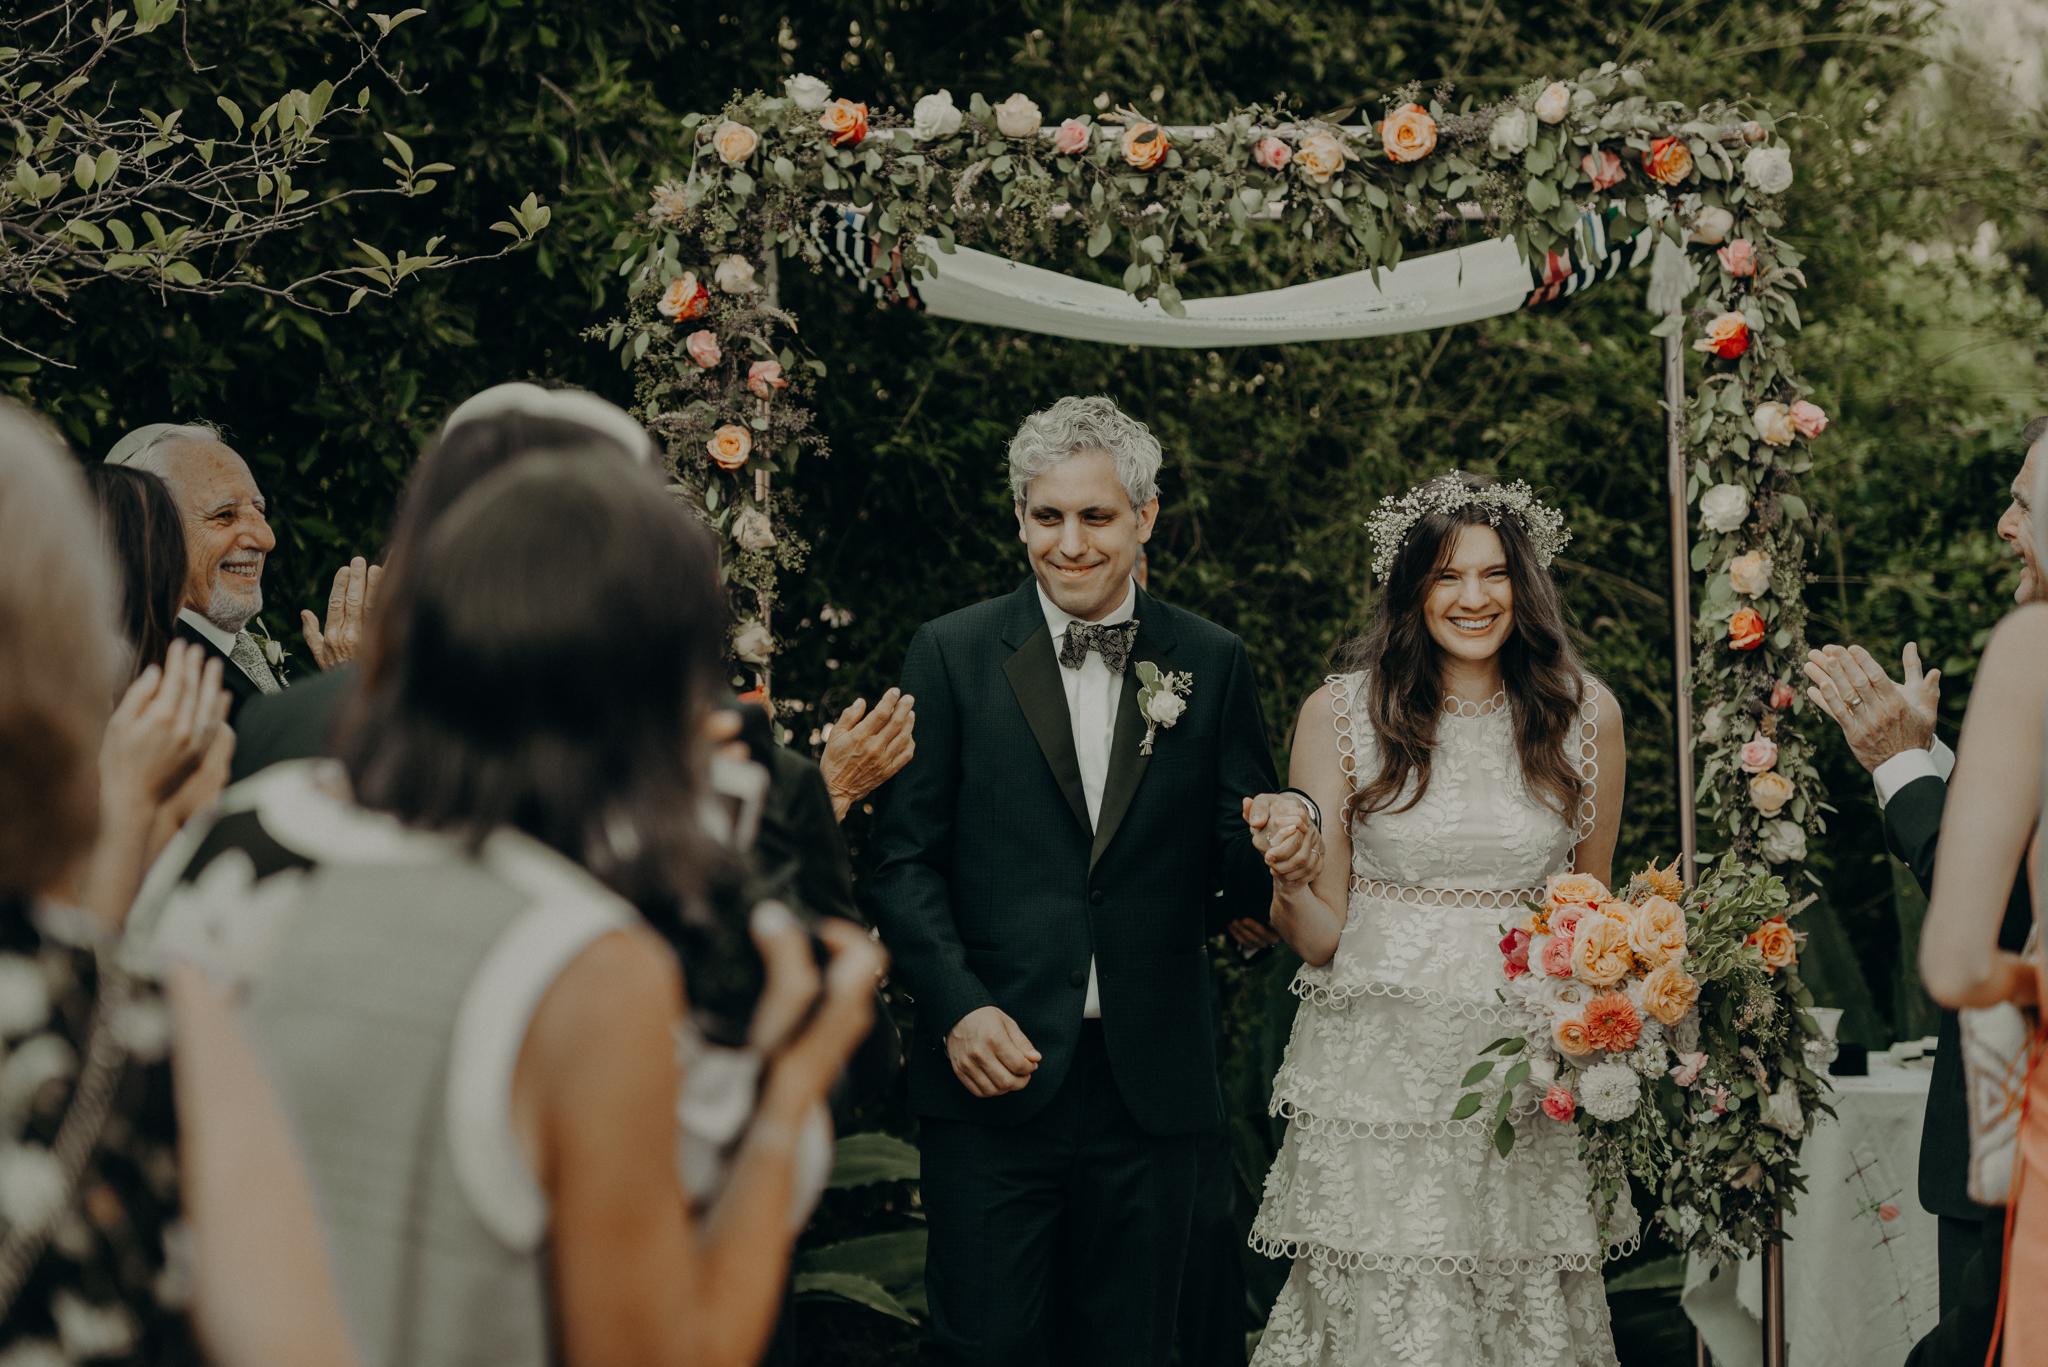 Isaiah + Taylor Photography - Private Estate Backyard Wedding - Beverly Hills - Los Angeles Wedding Photographer - 82.jpg